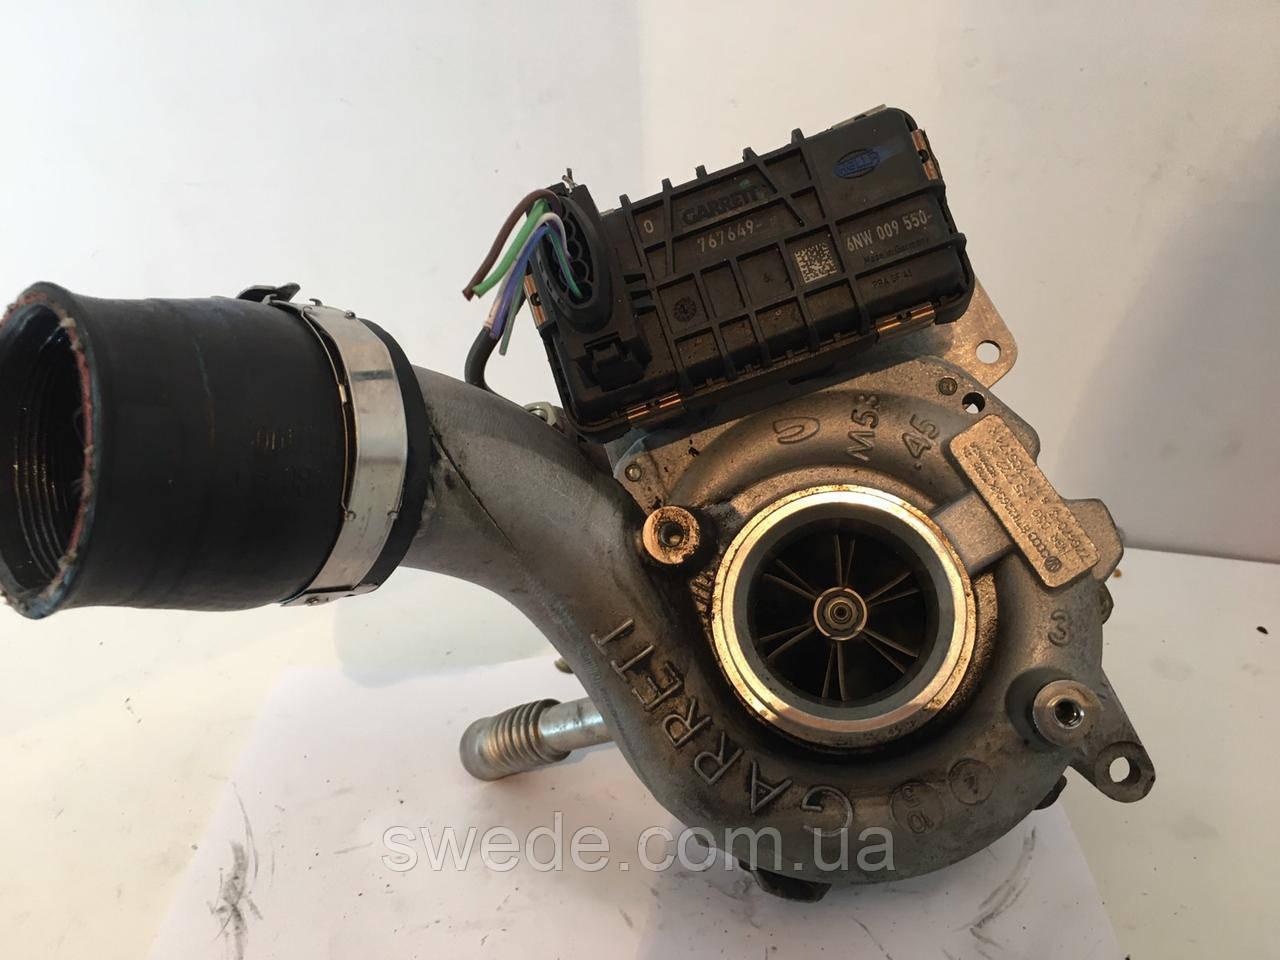 Турбина Volkswagen Phaeton Touareg 3.0 TDI 2011 гг 059145722R